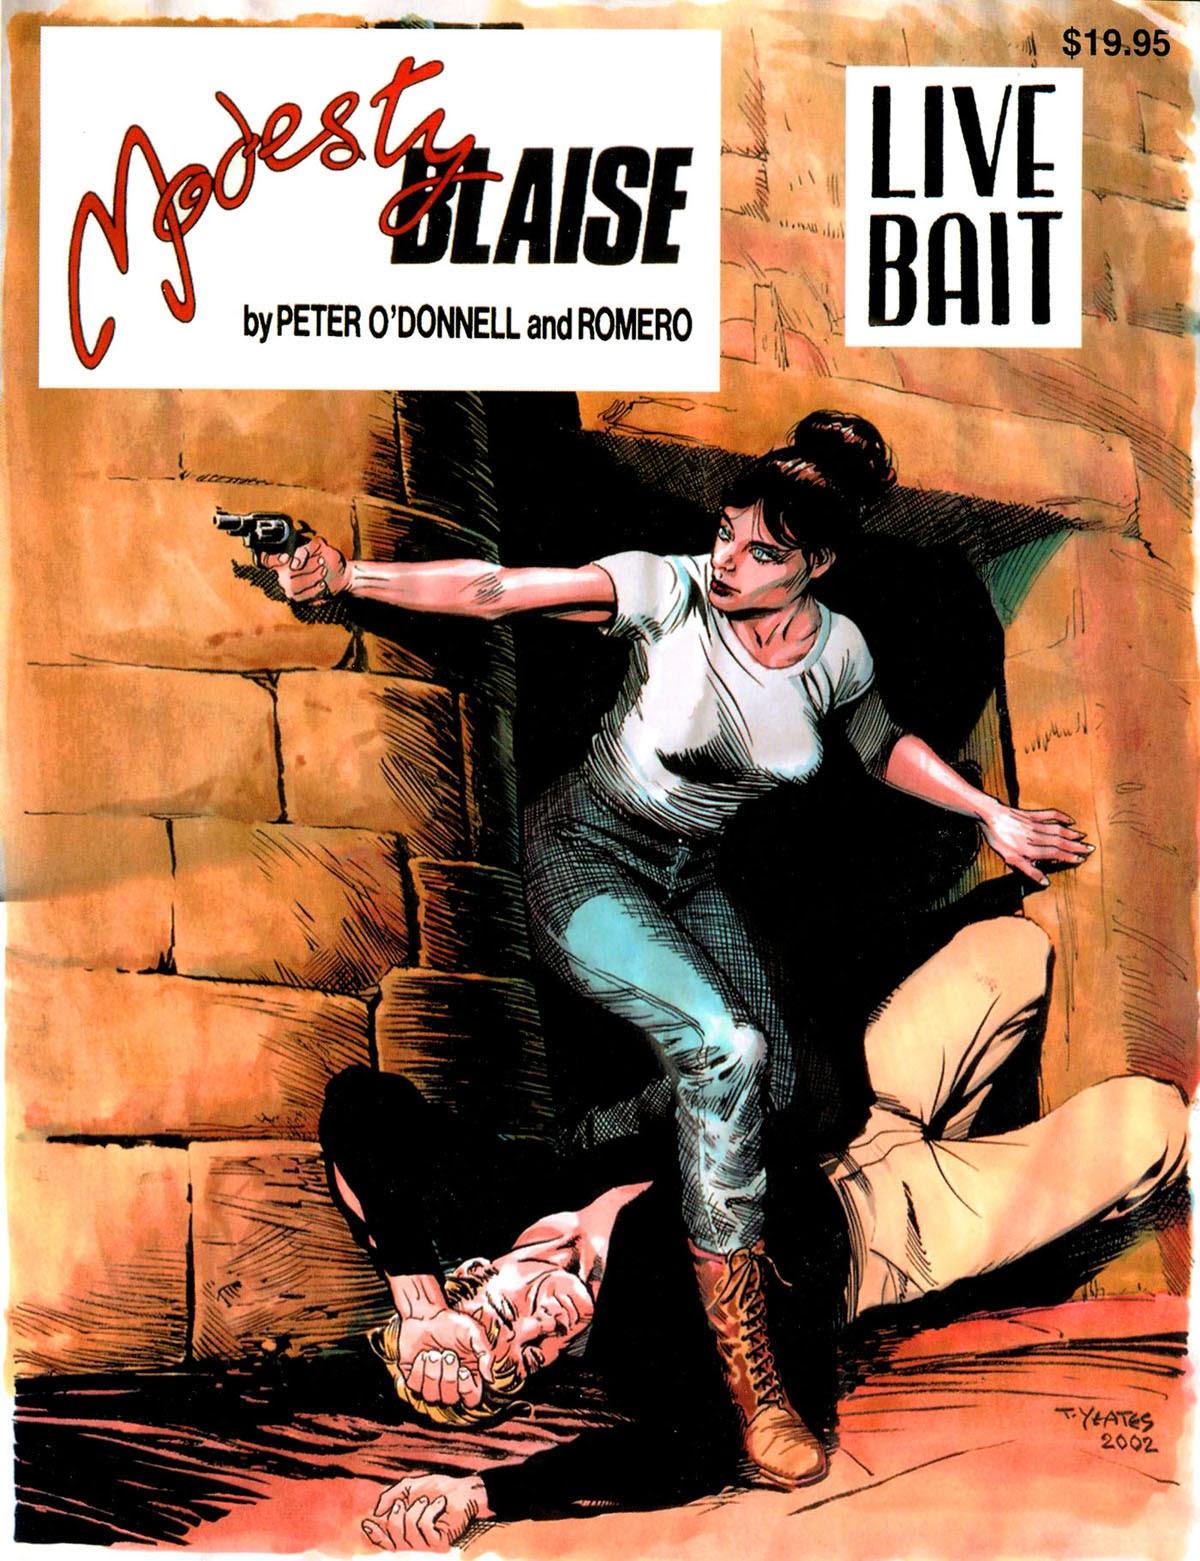 Read online Modesty Blaise Live bait comic -  Issue # TPB - 1